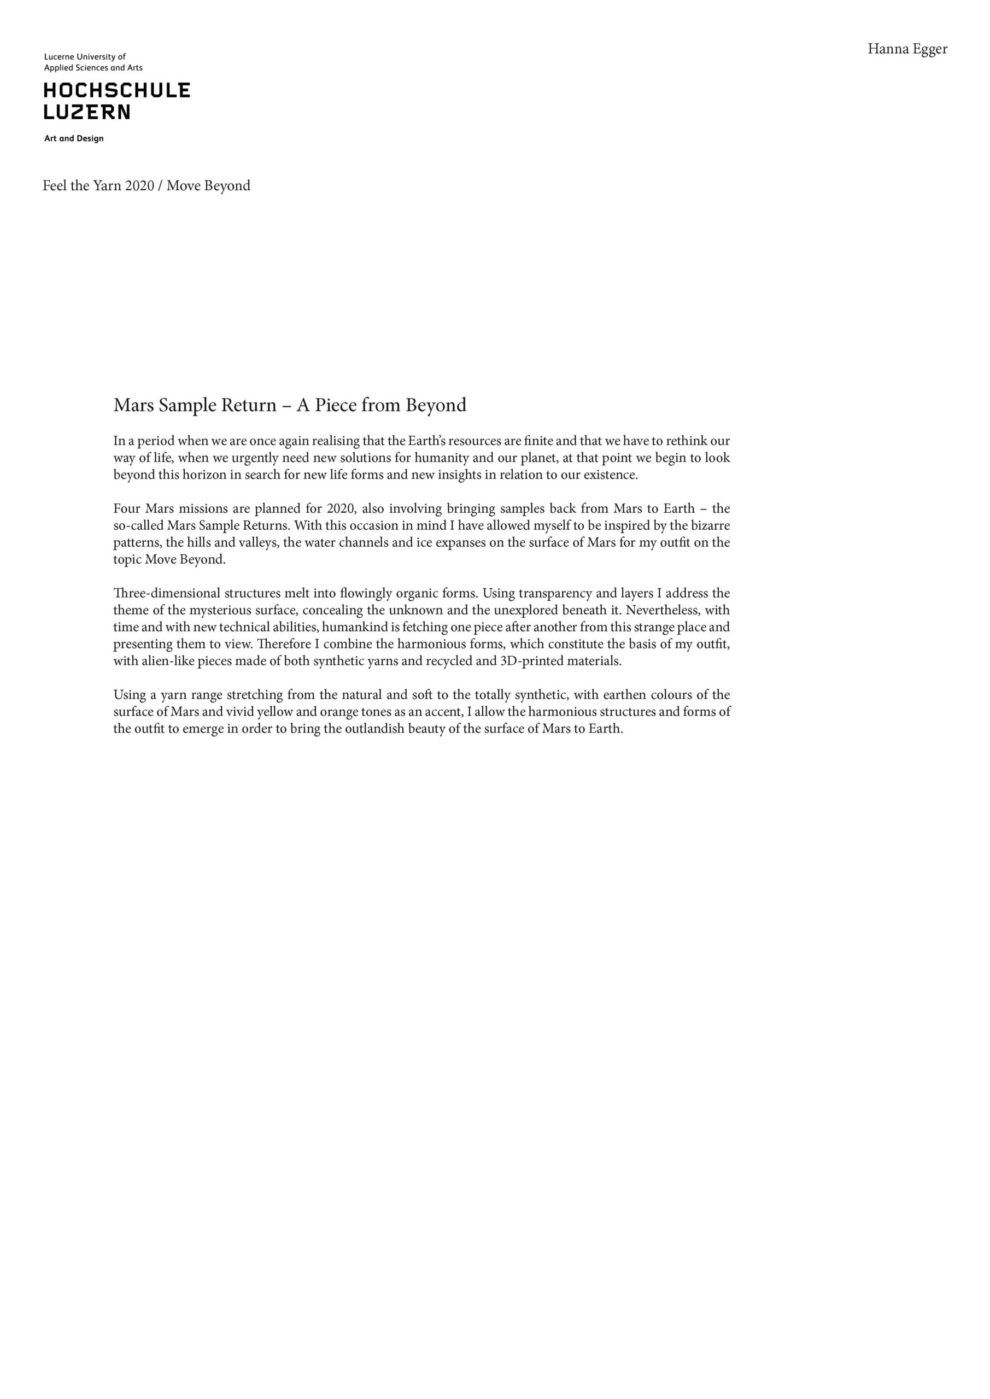 feeltheyarn2020 HannaEgger Page 2 scaled 1